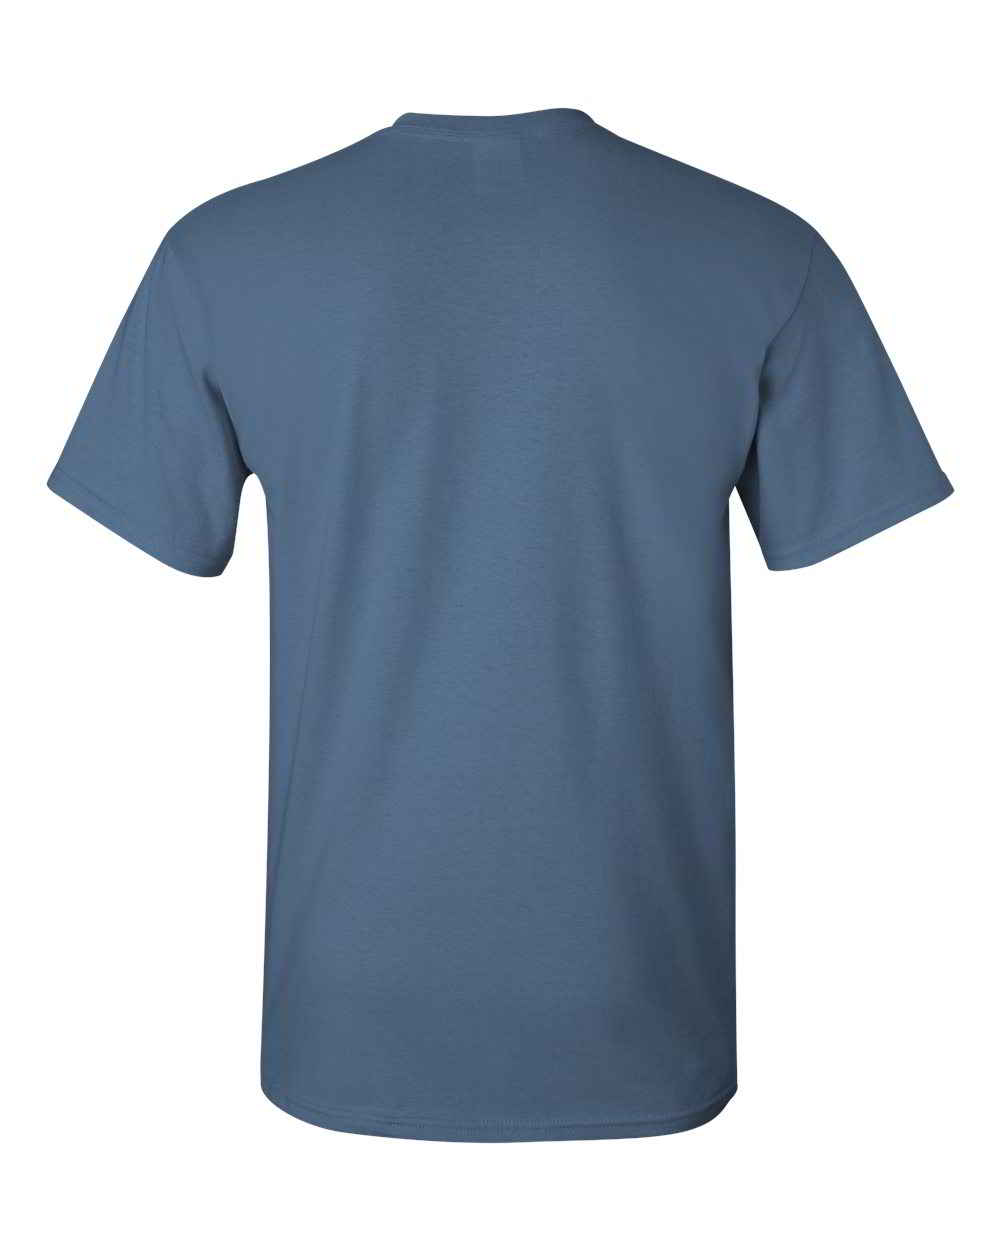 Gildan-Heavy-Cotton-Short-Sleeve-Mens-Blue-T-Shirts-5000 thumbnail 16